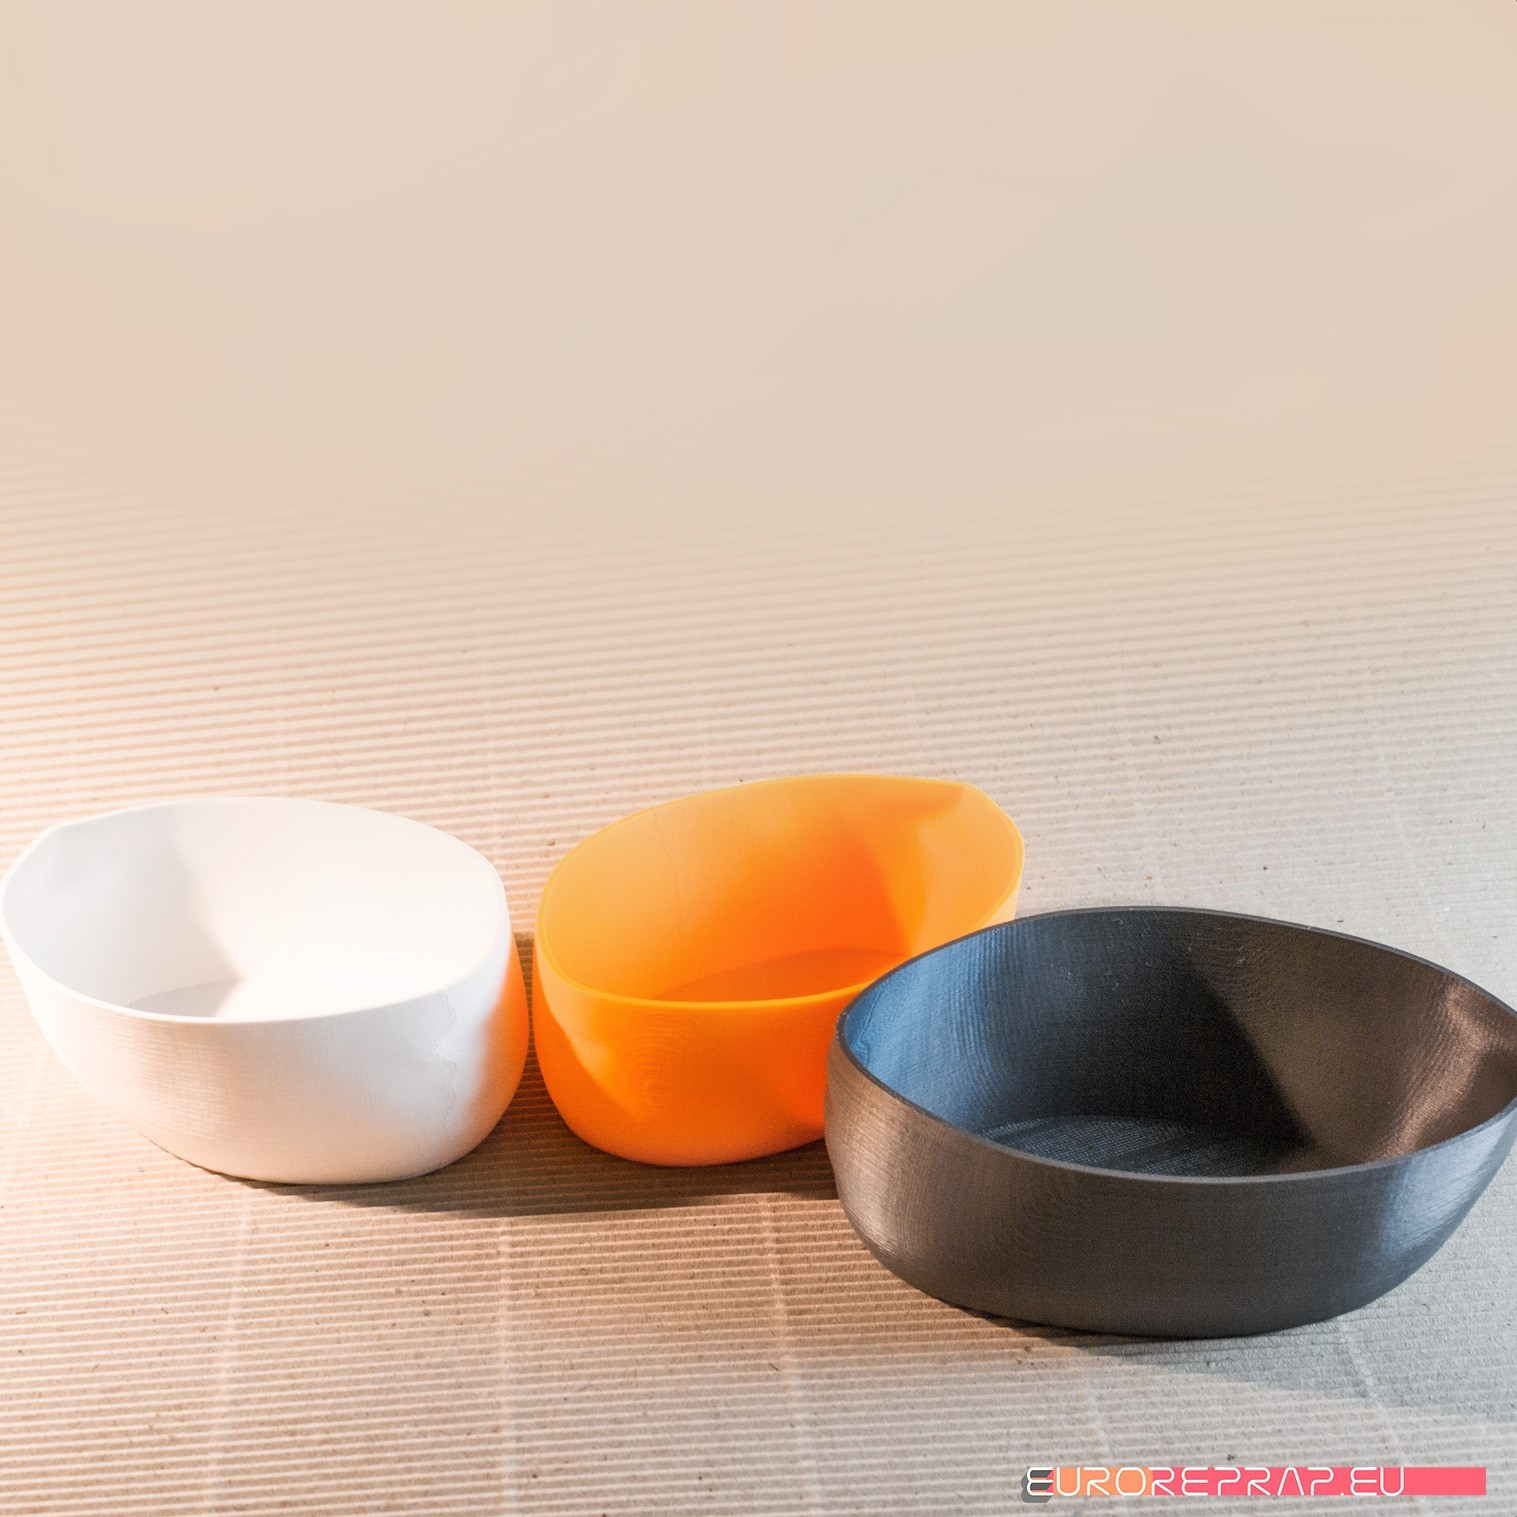 07_DSC3359.jpg Download STL file Handy - stackable bowls • 3D print template, euroreprap_eu